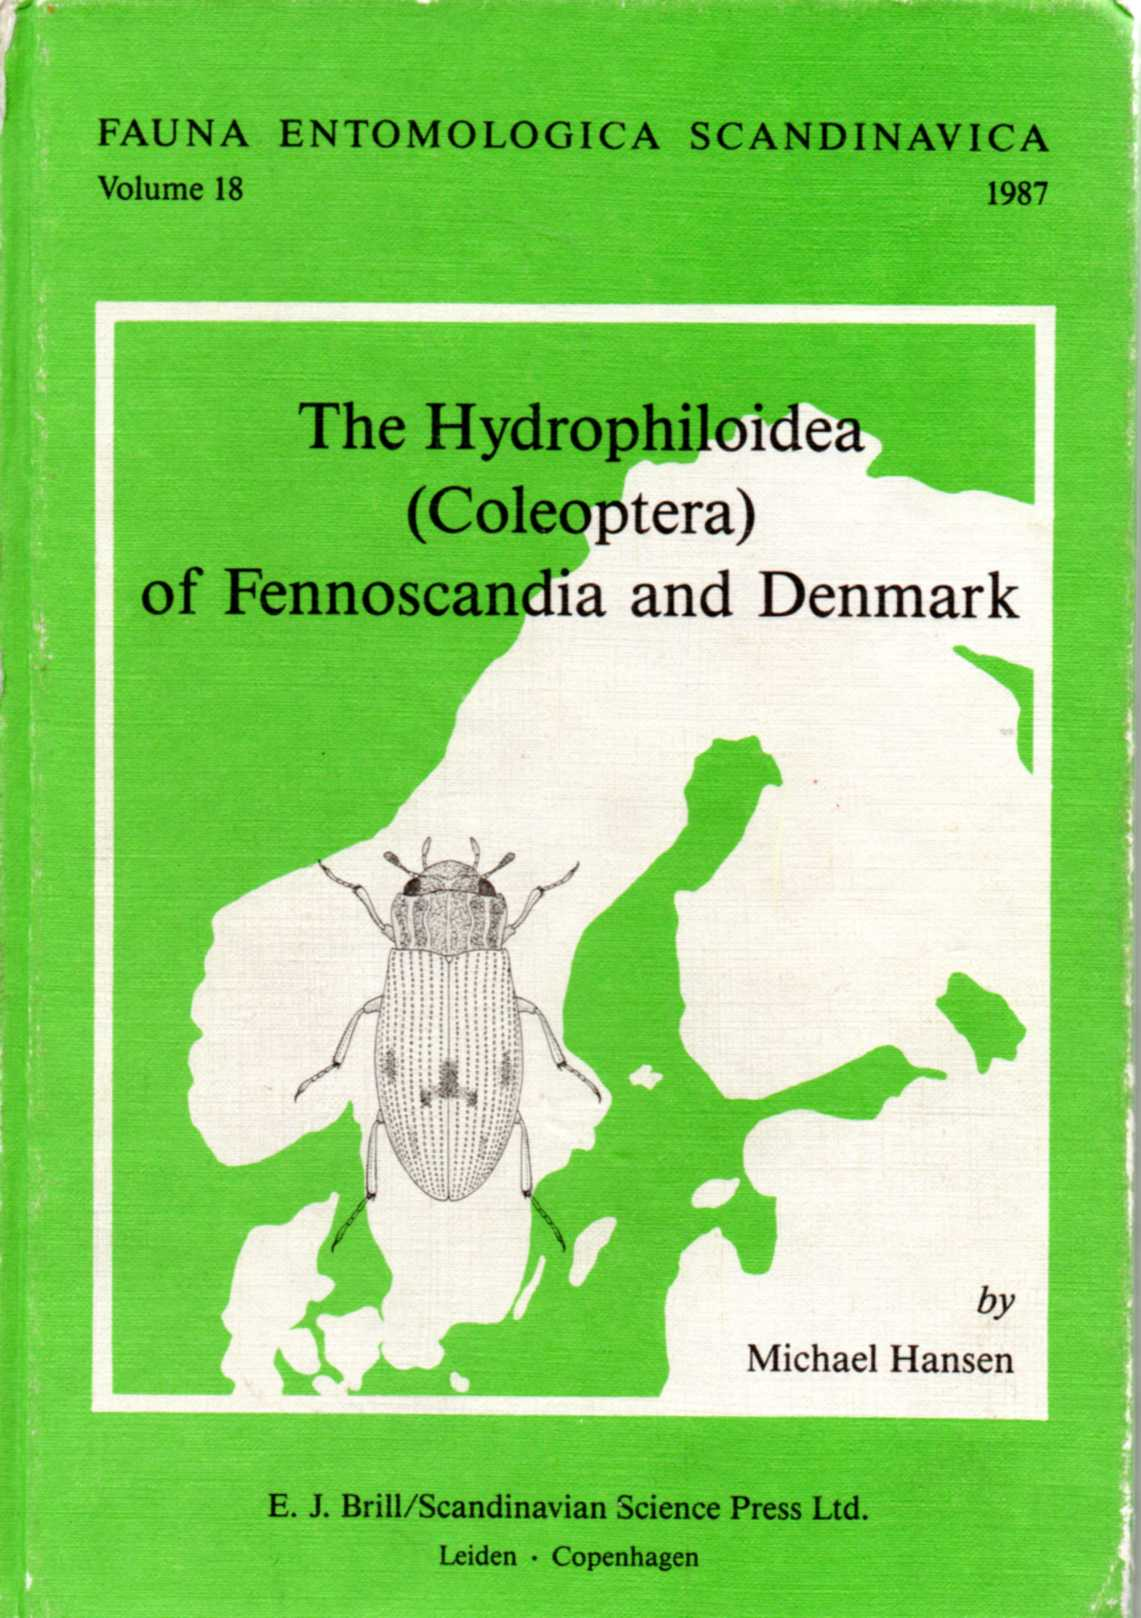 """The Hydrophiloidea (Coleoptera) of Fennoscandia and Denmark"""